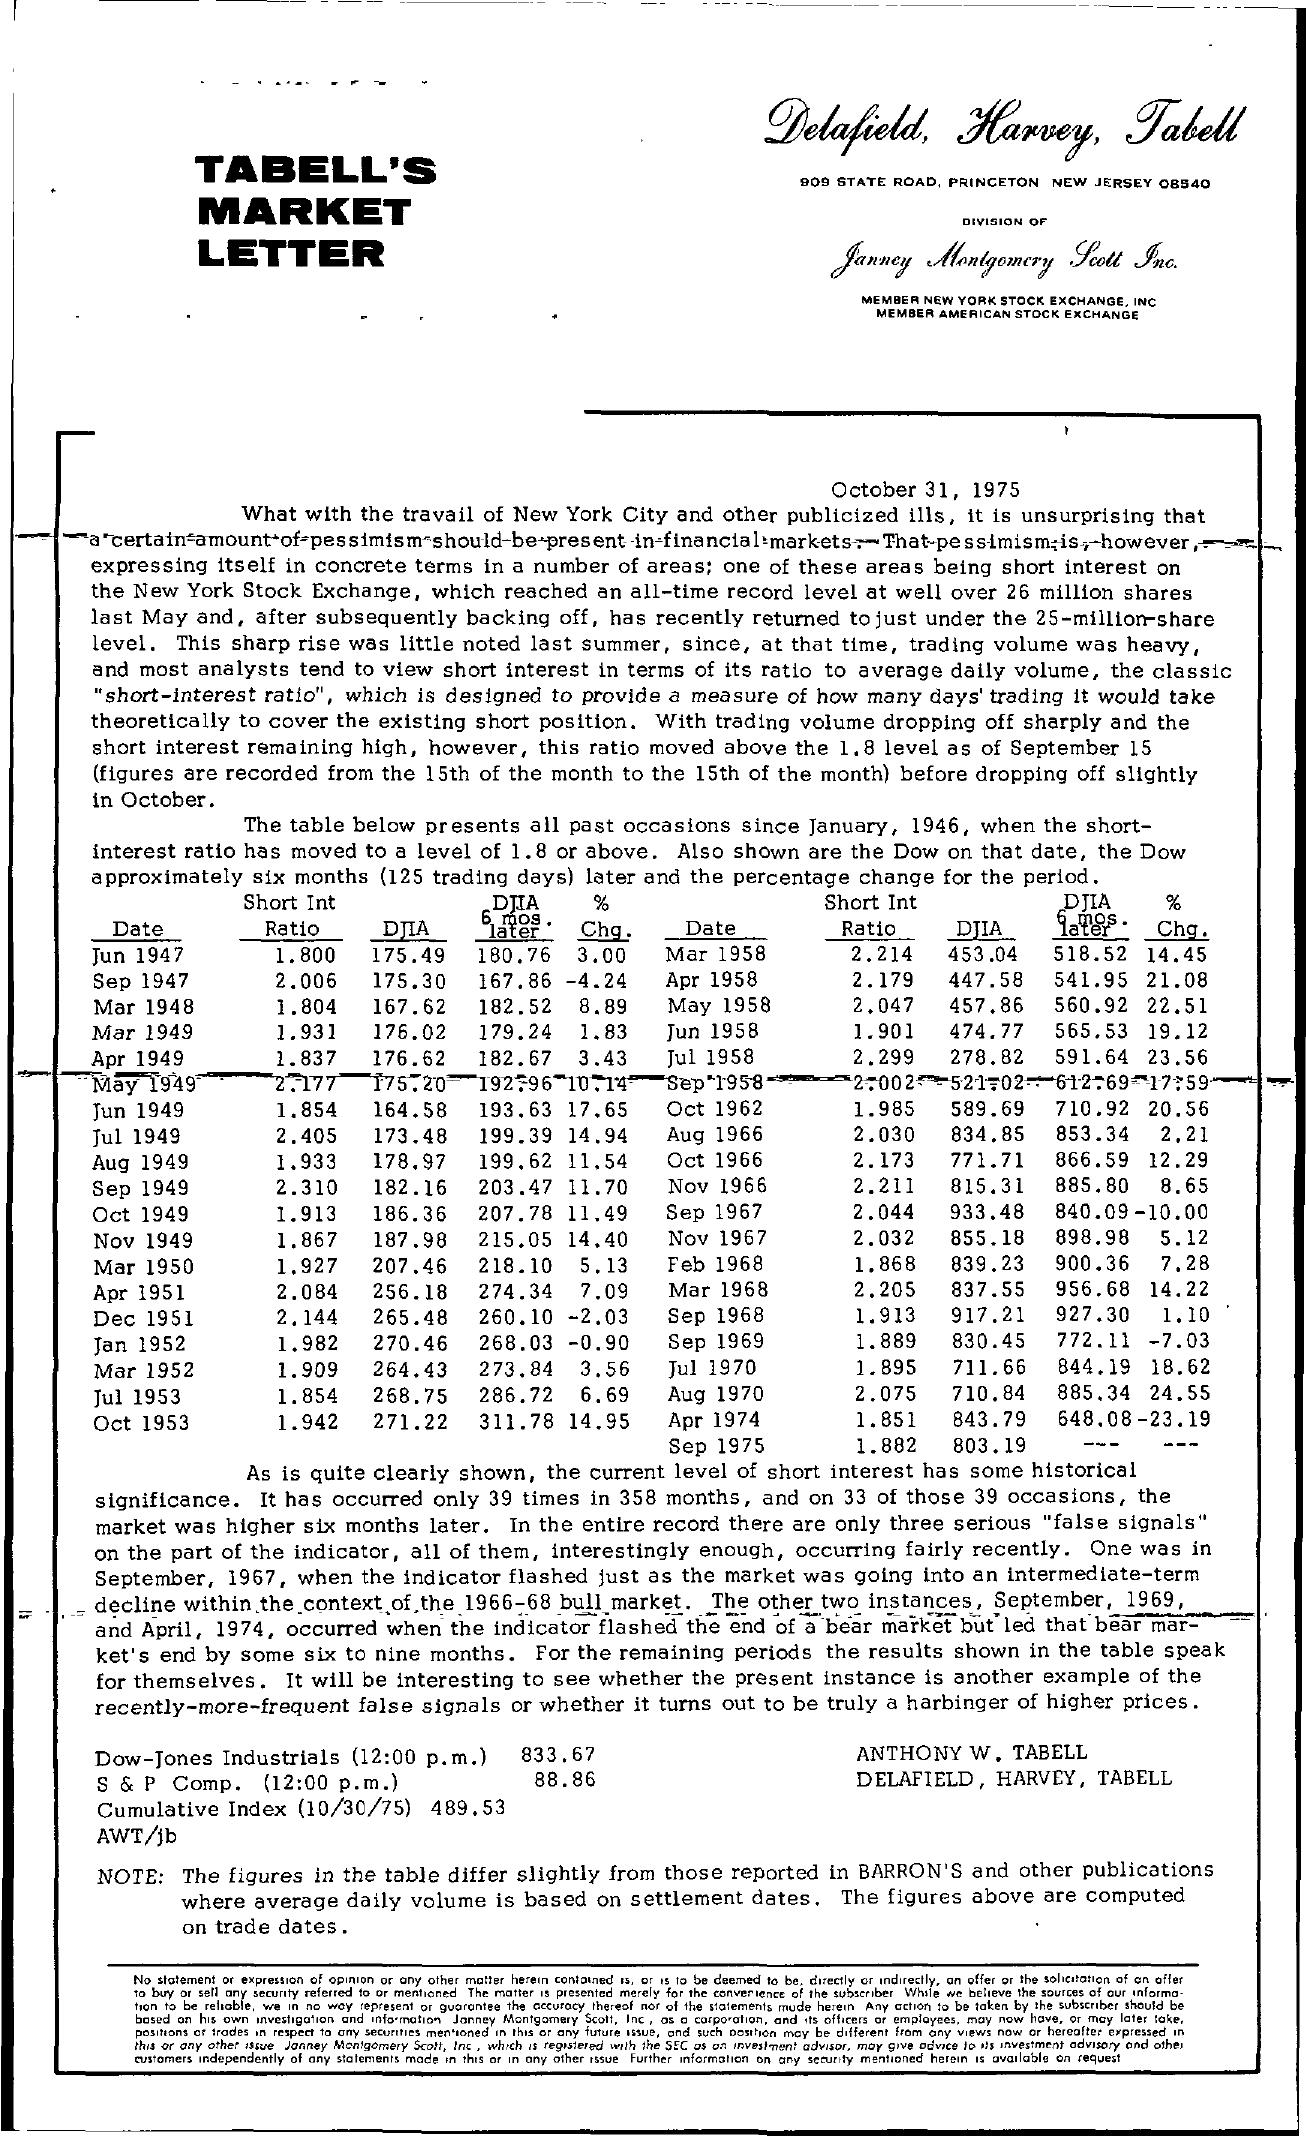 Tabell's Market Letter - October 31, 1975